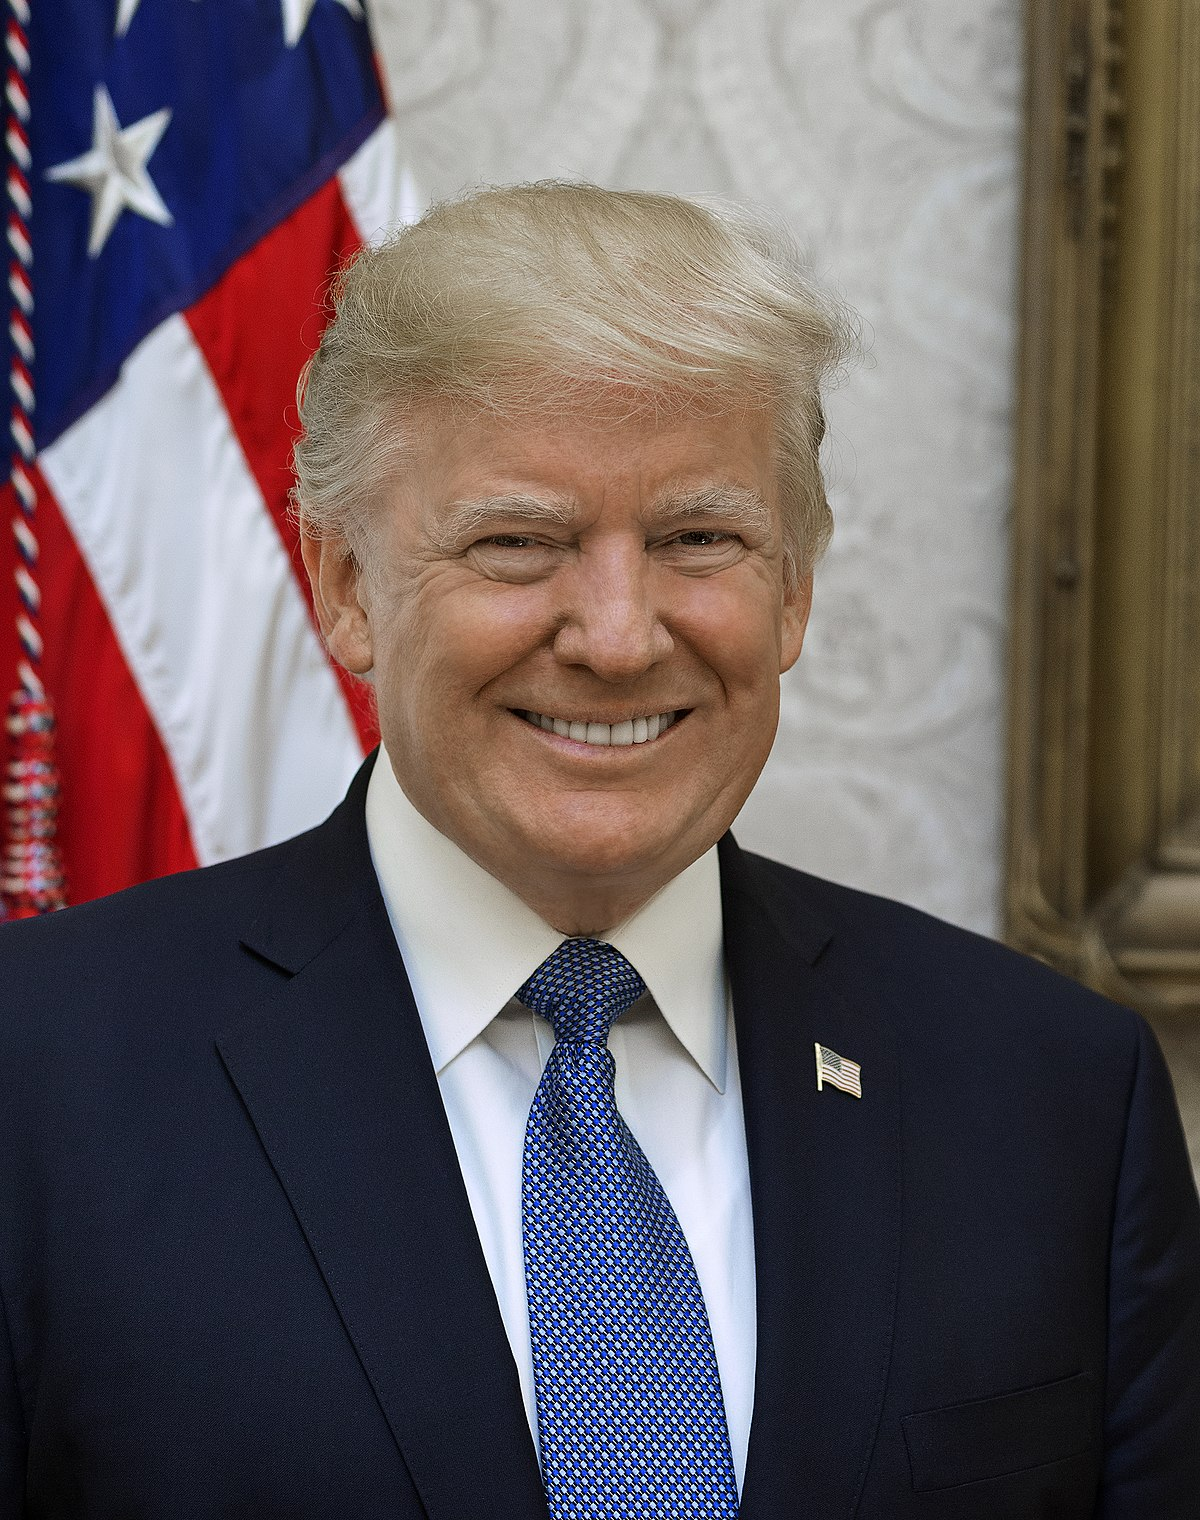 Donald Trump - Präsident Donald Trump - President Donald Trump